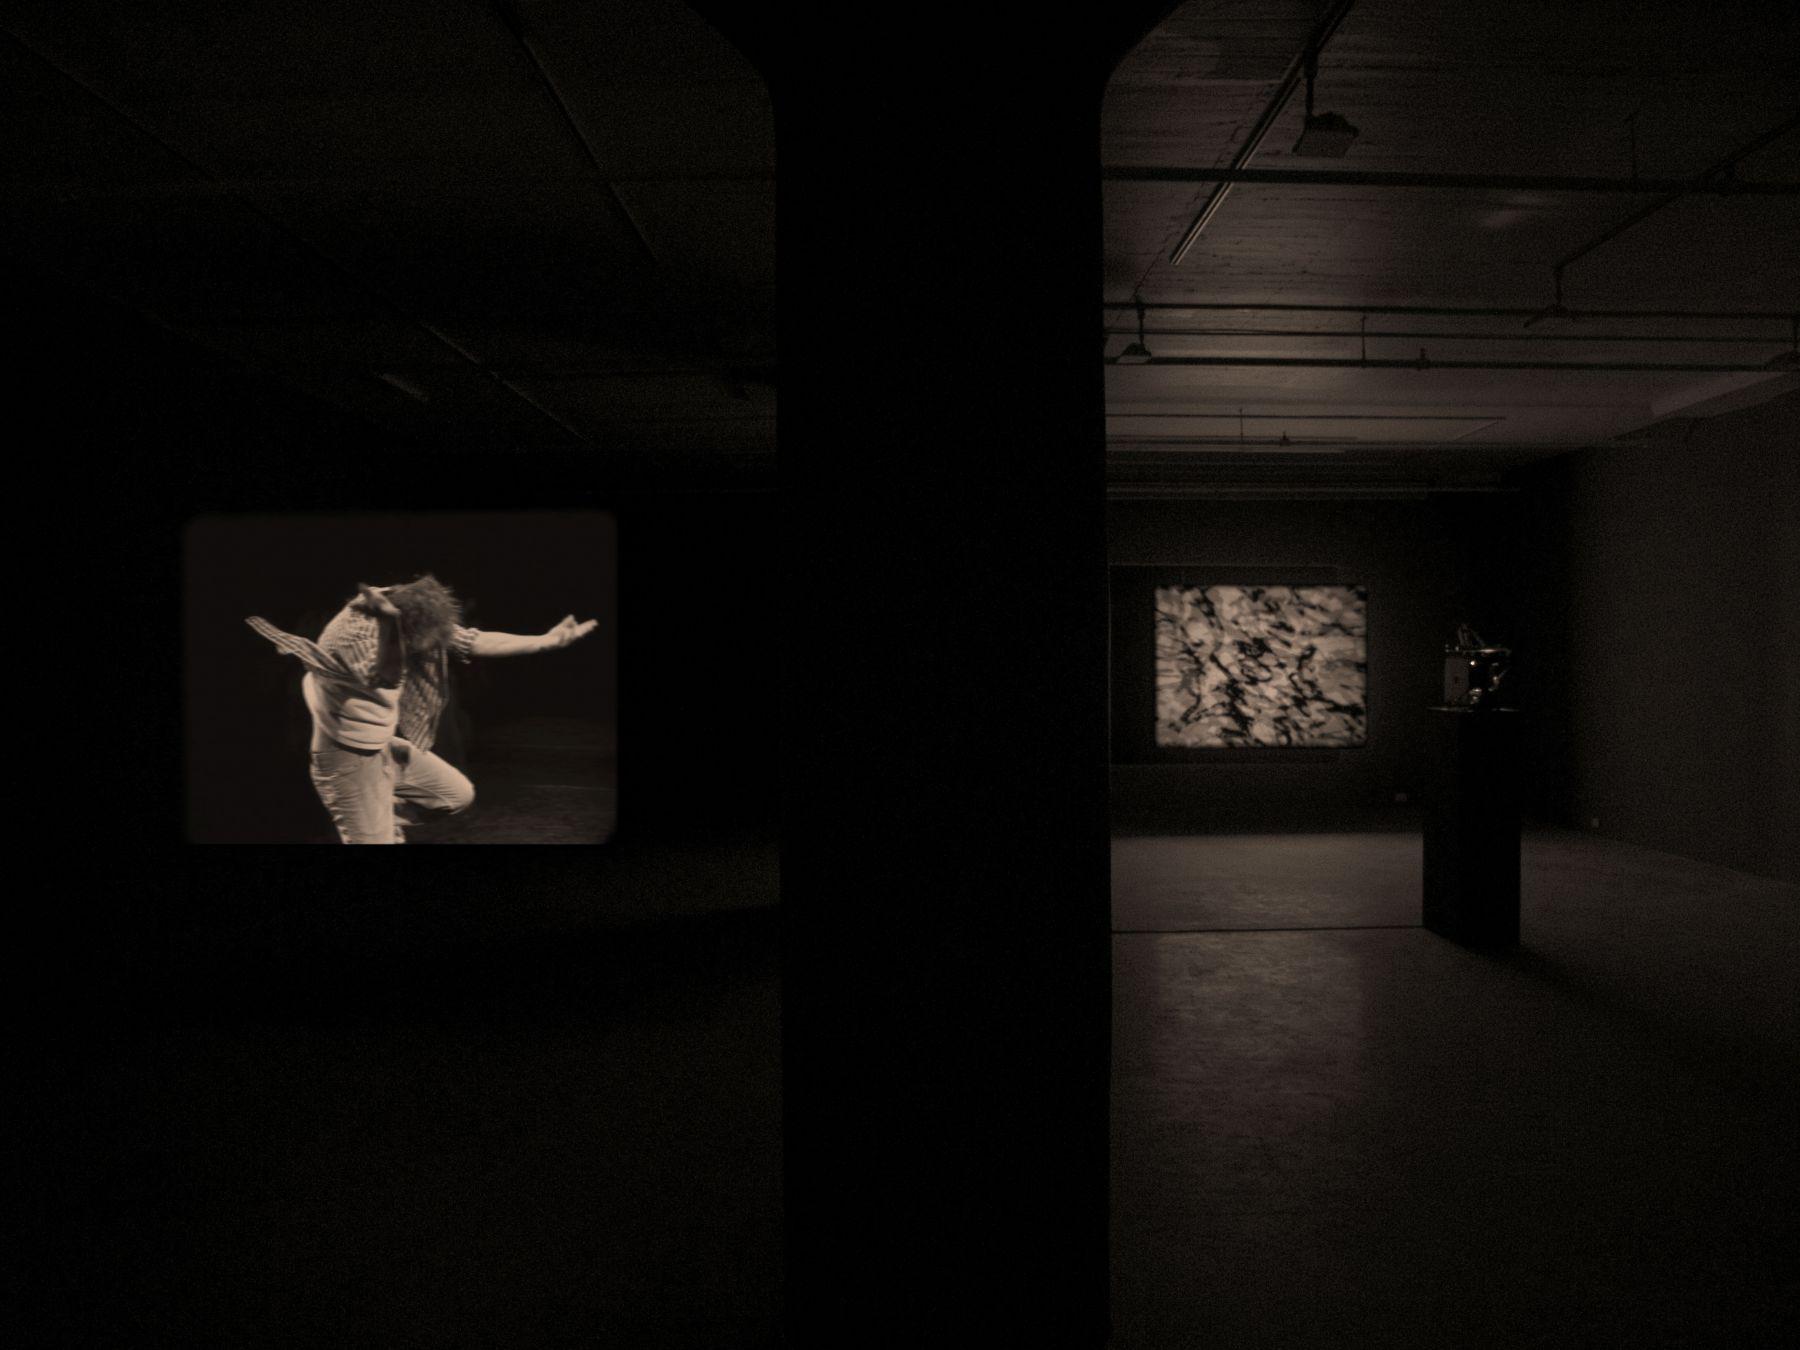 Joachim Koester, Installation view, From the Secret Garden of Sleep, Greene Naftali, New York, 2010